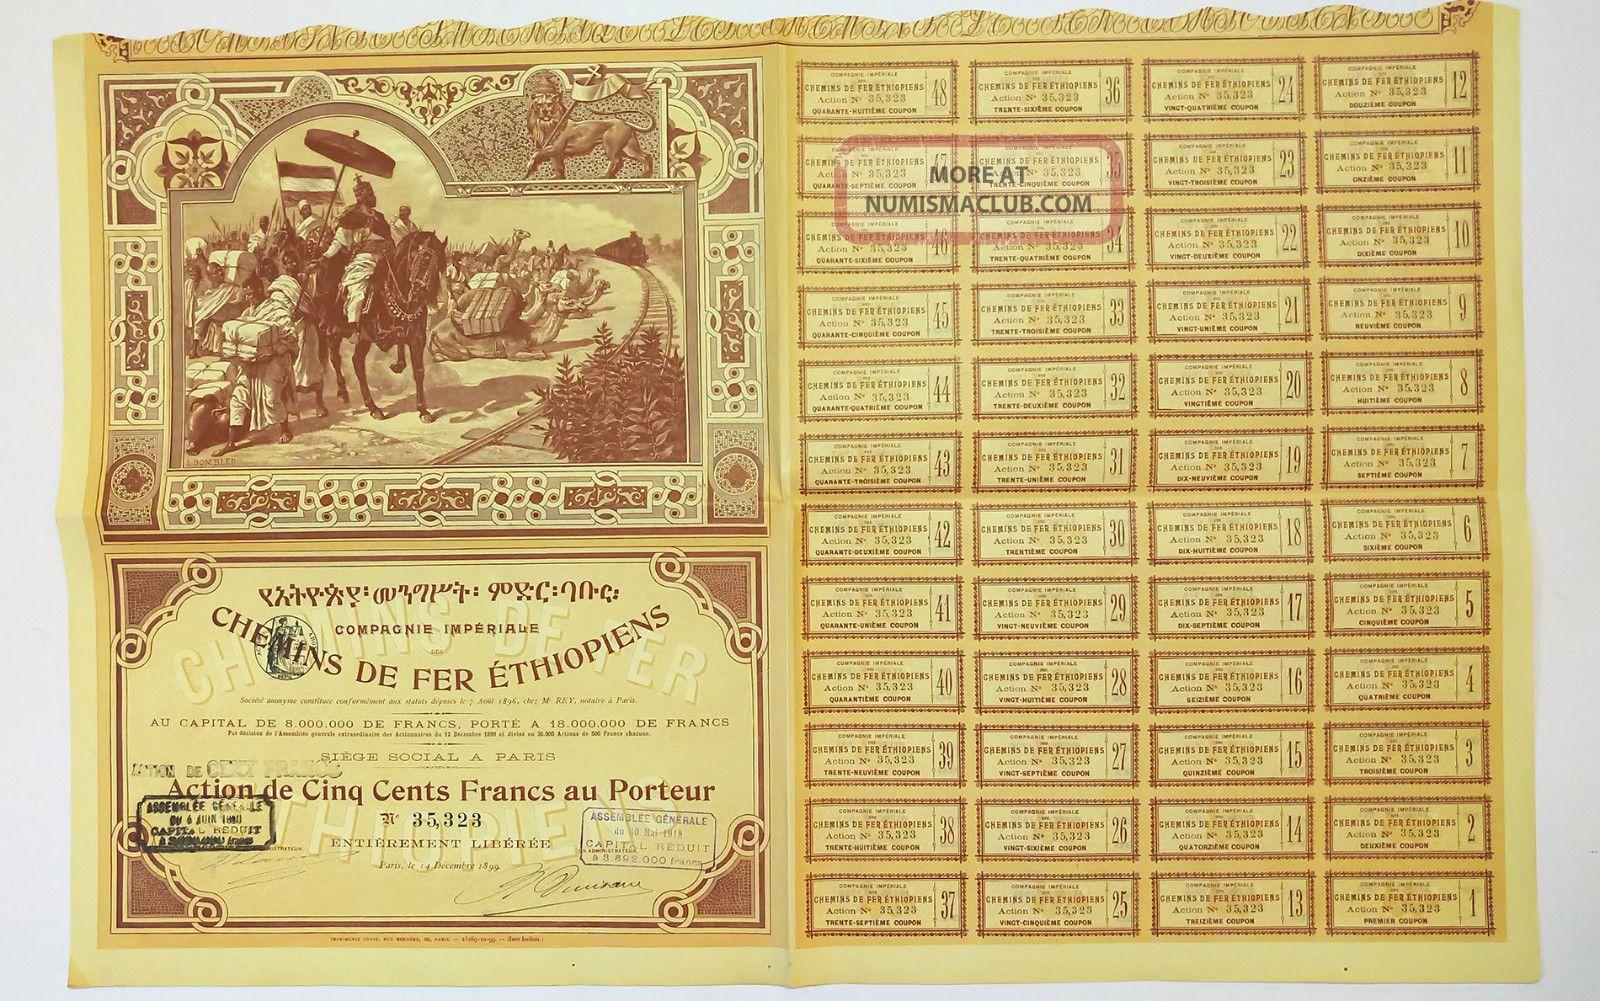 Africa - Cie Imperiale Des Chemins De Fer Ethiopiens 500f 1899 High Illustrated World photo